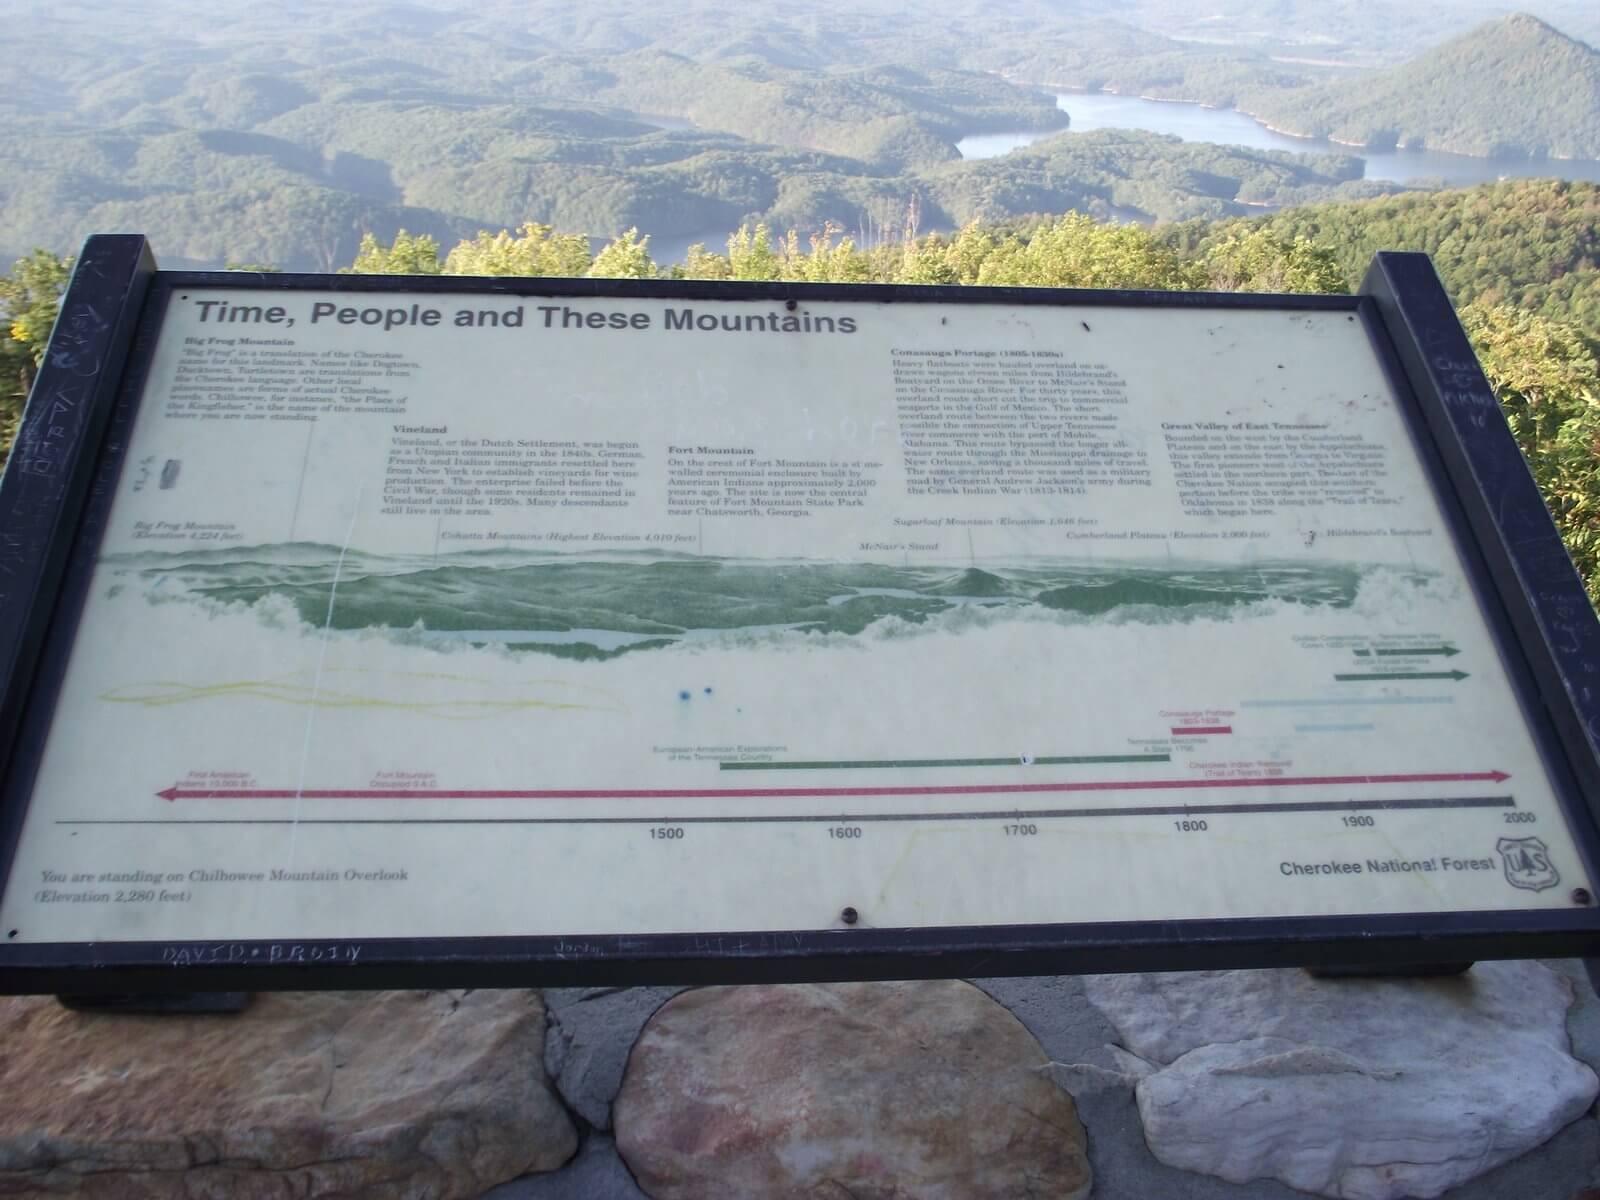 chilhowee mountain overlook